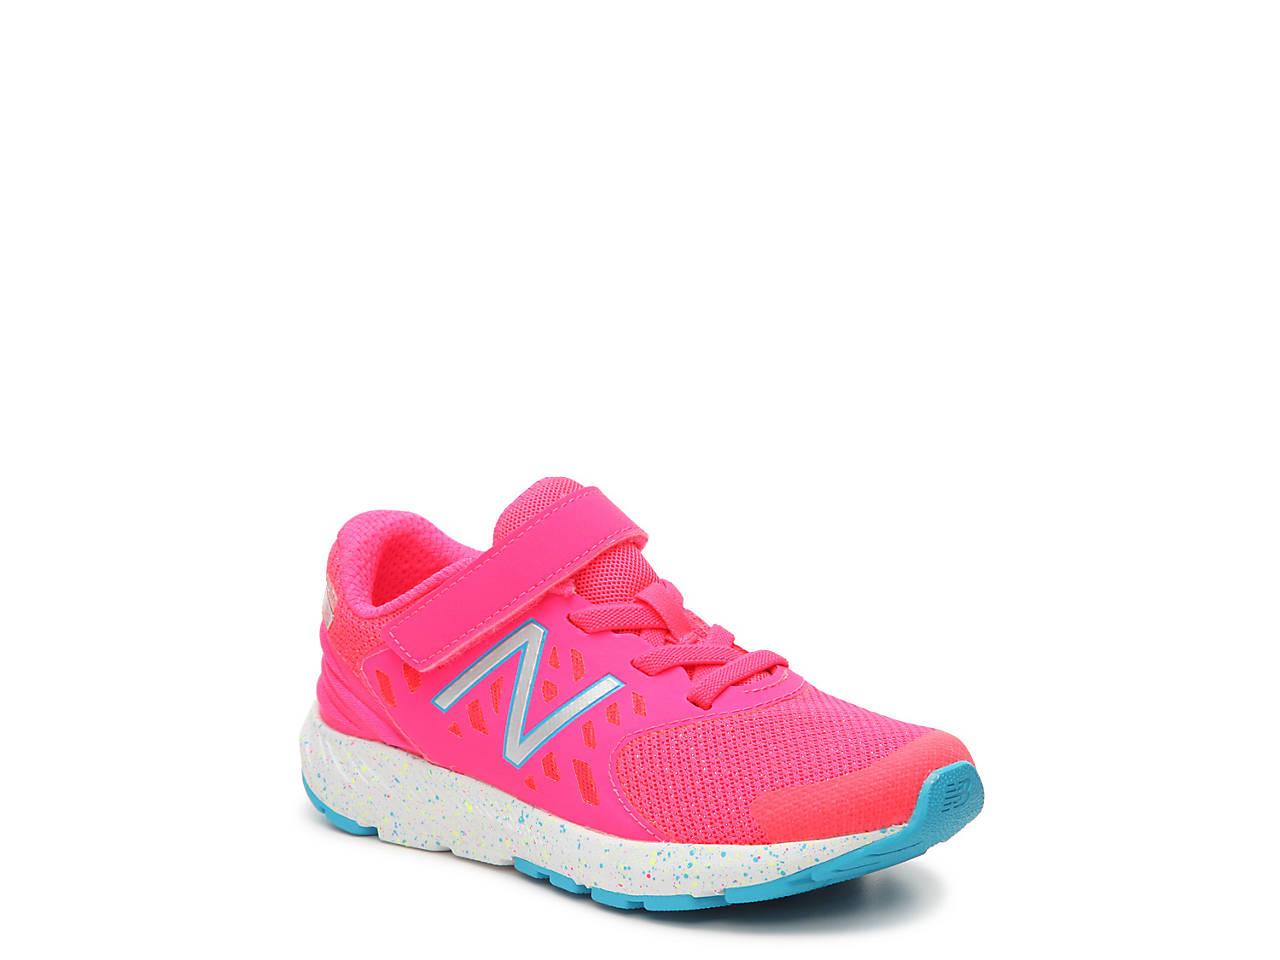 84b583338dbb9 New Balance FuelCore Urge Running Shoe - Kids' Kids Shoes   DSW